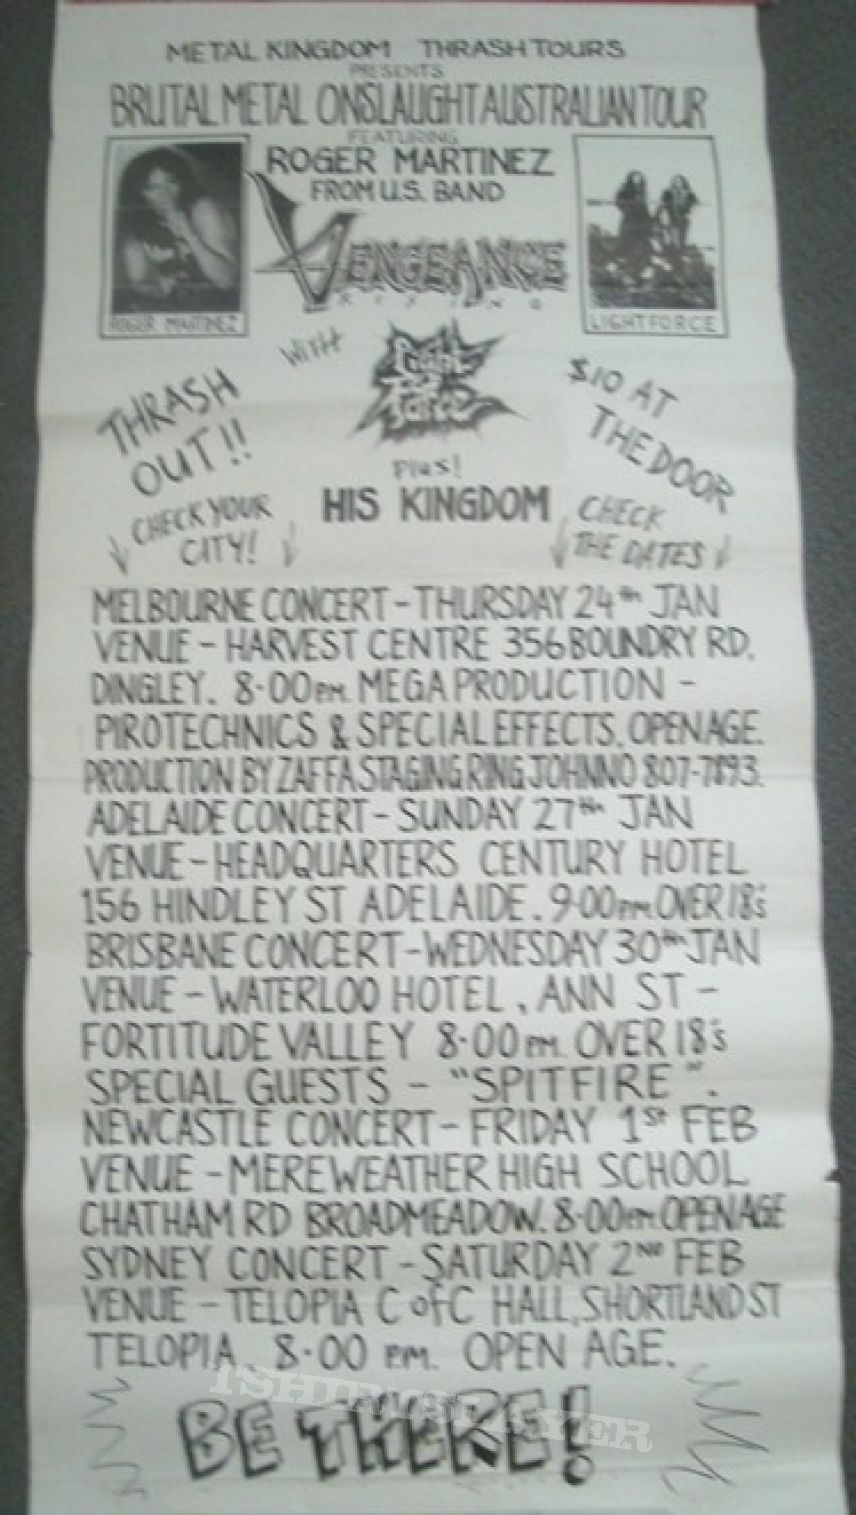 Lightforce -Australian Tour 1991 poster with Roger Martinez